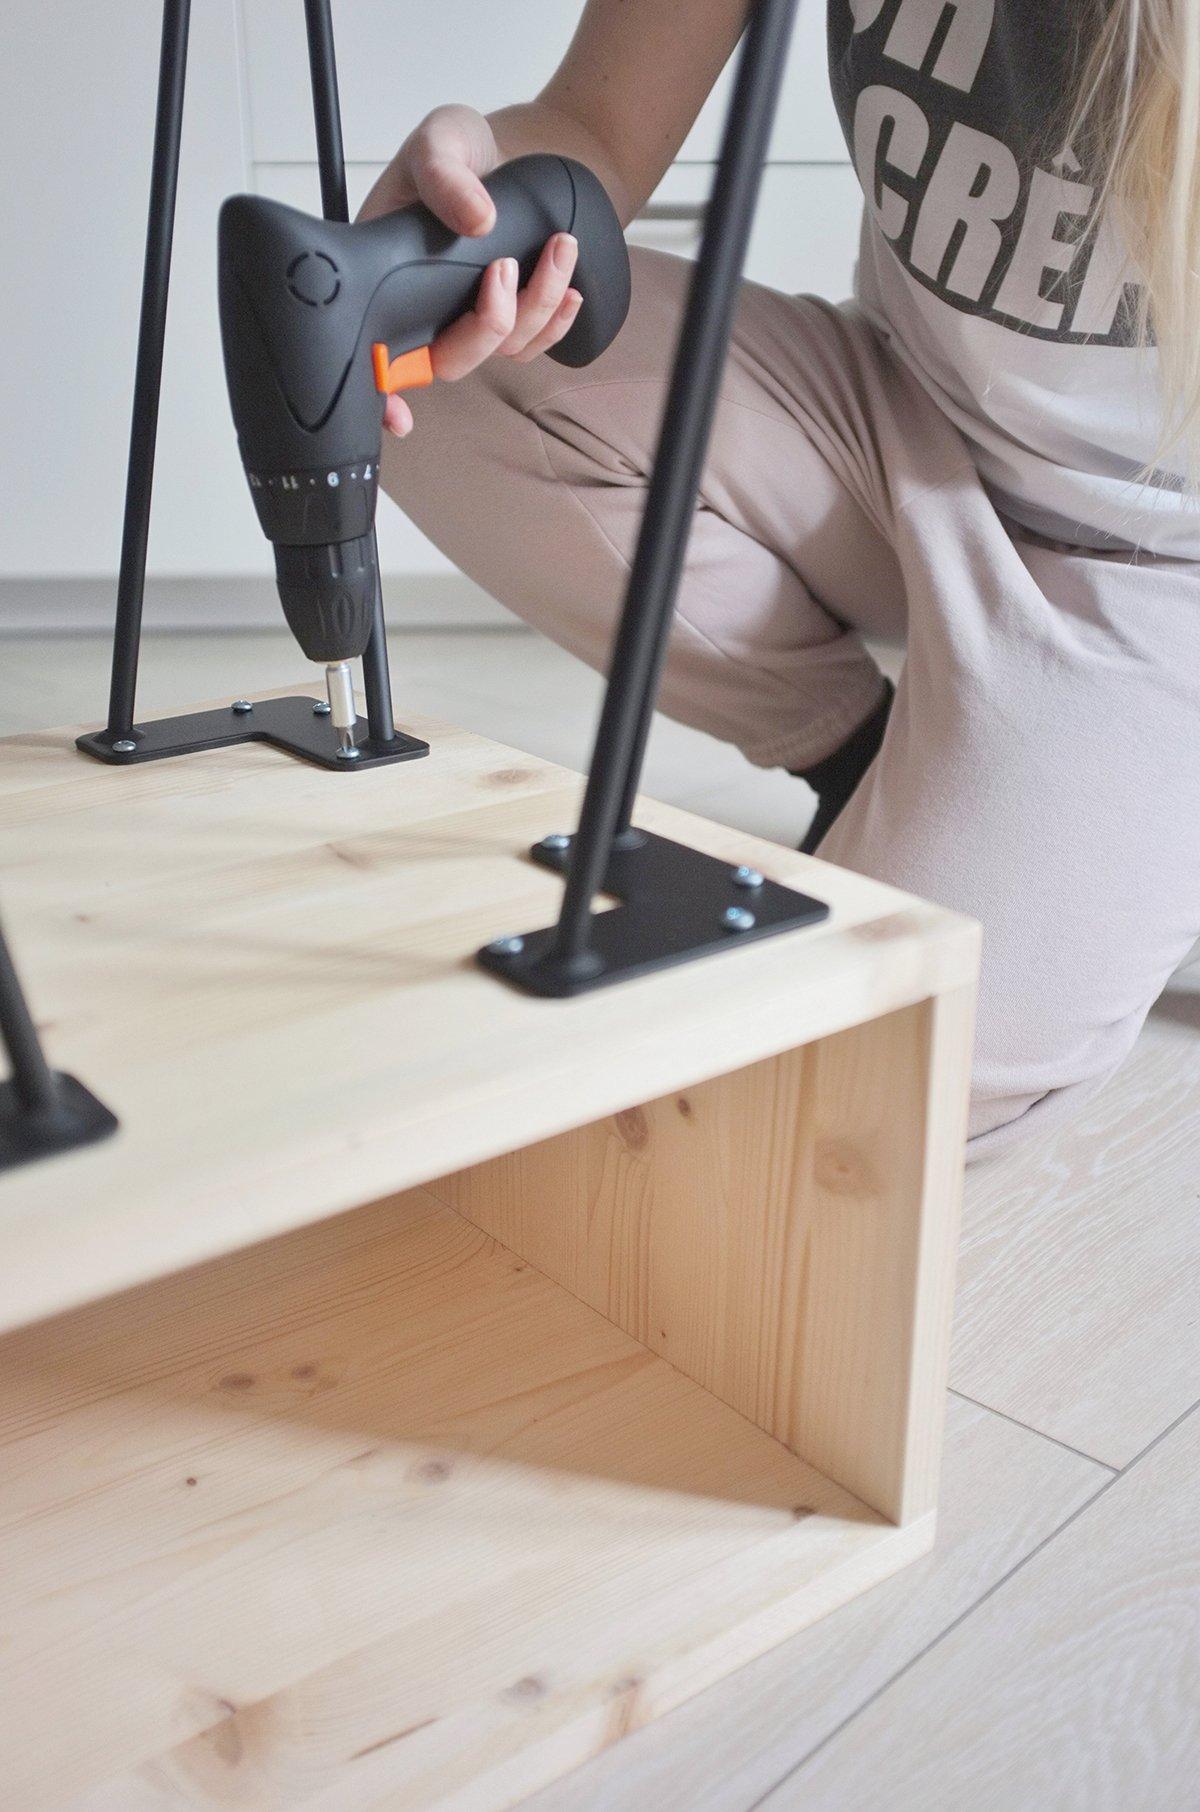 diy interior nightstand hairpinlegs drill